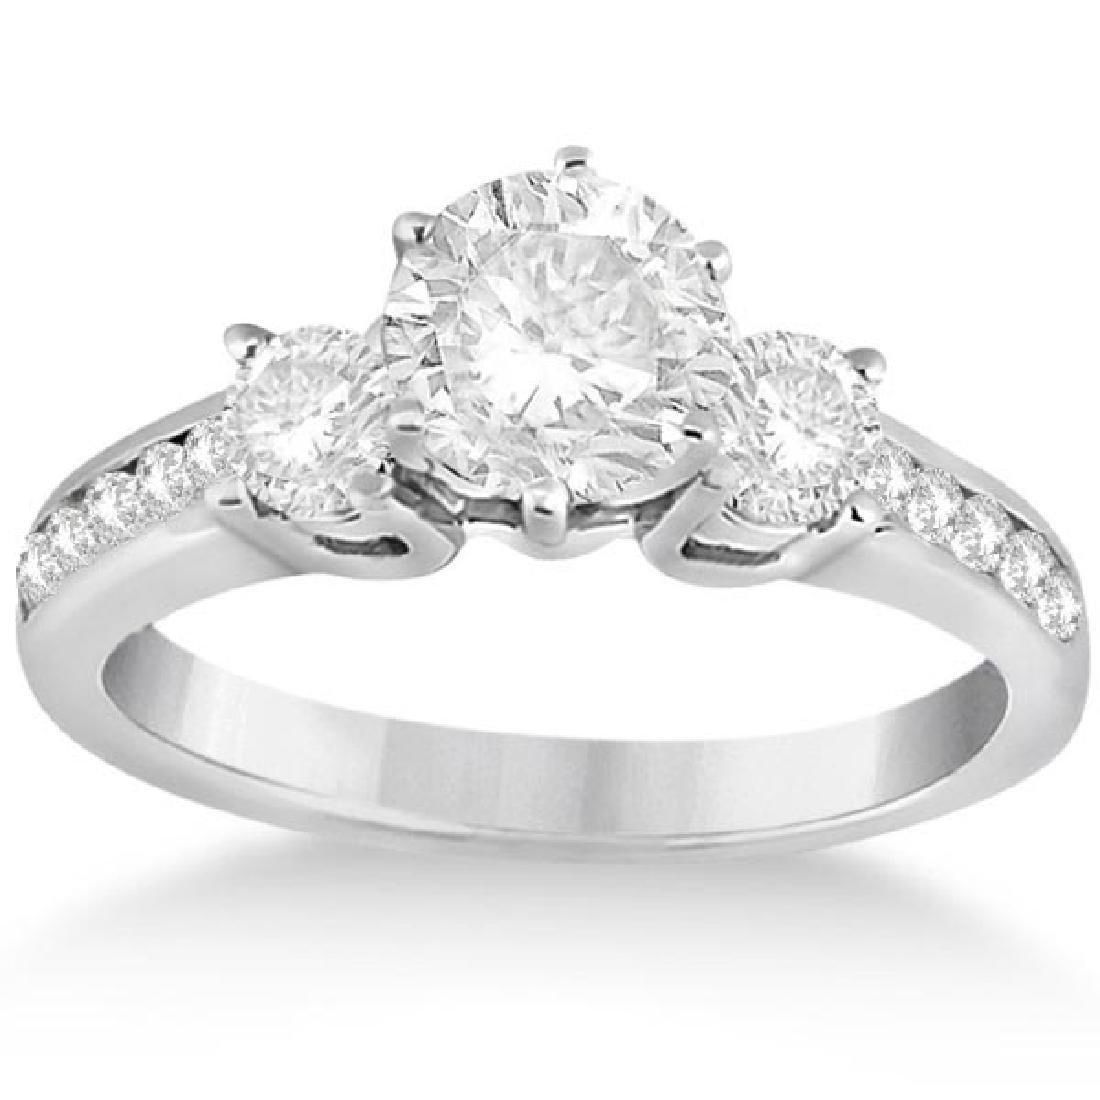 Three-Stone Diamond Engagement Ring in White Gold 1.70